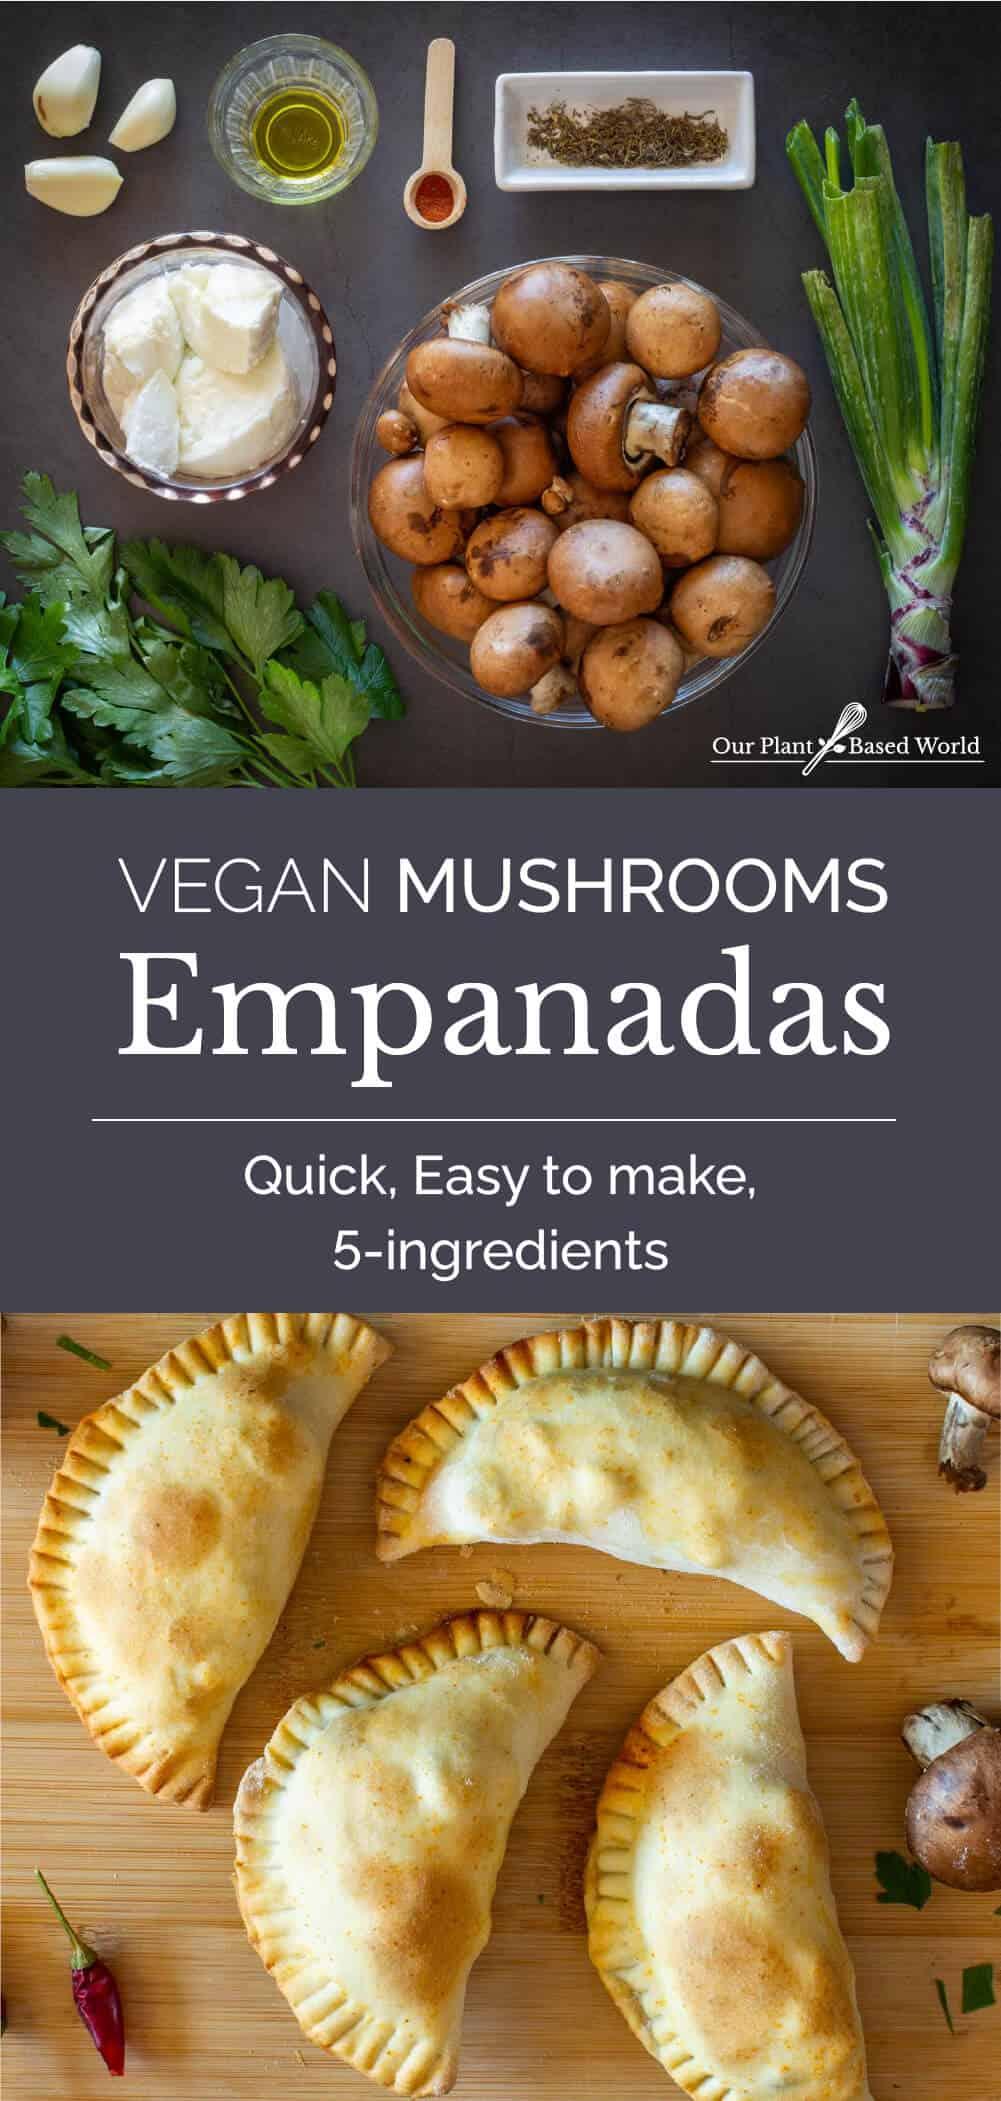 Mushrooms Empanadas served